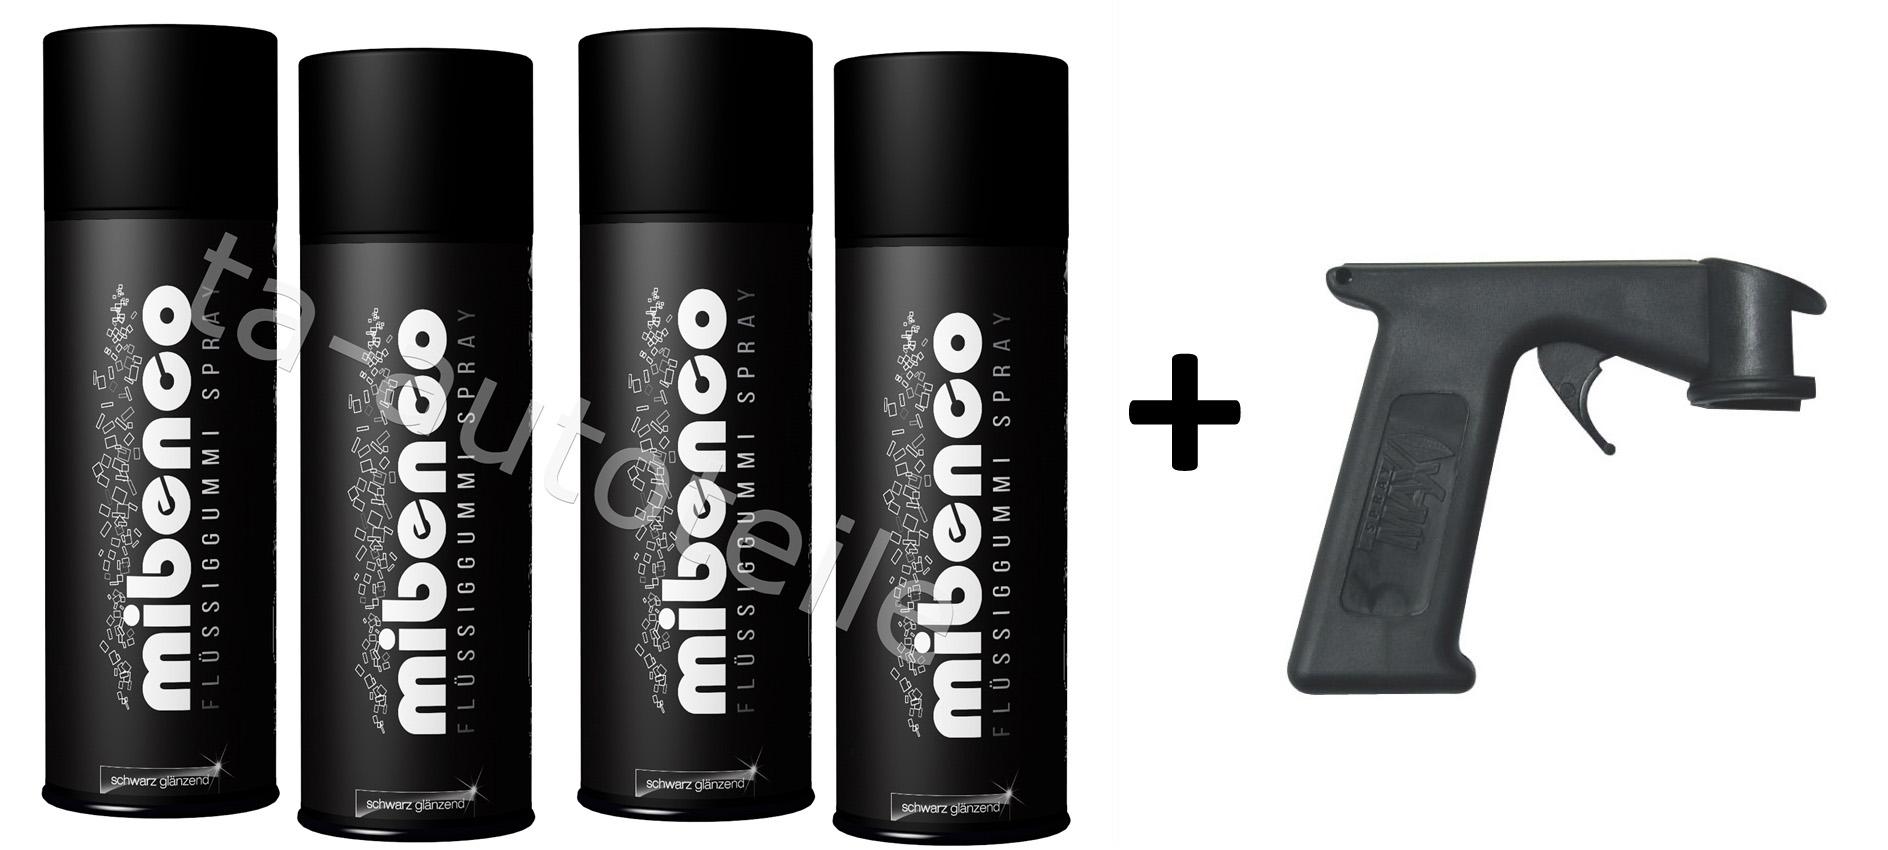 Mibenco SPRÜHFOLIE Felgenfolie Flüssiggummi schwarz glänzend 4x400ml +Sprühgriff